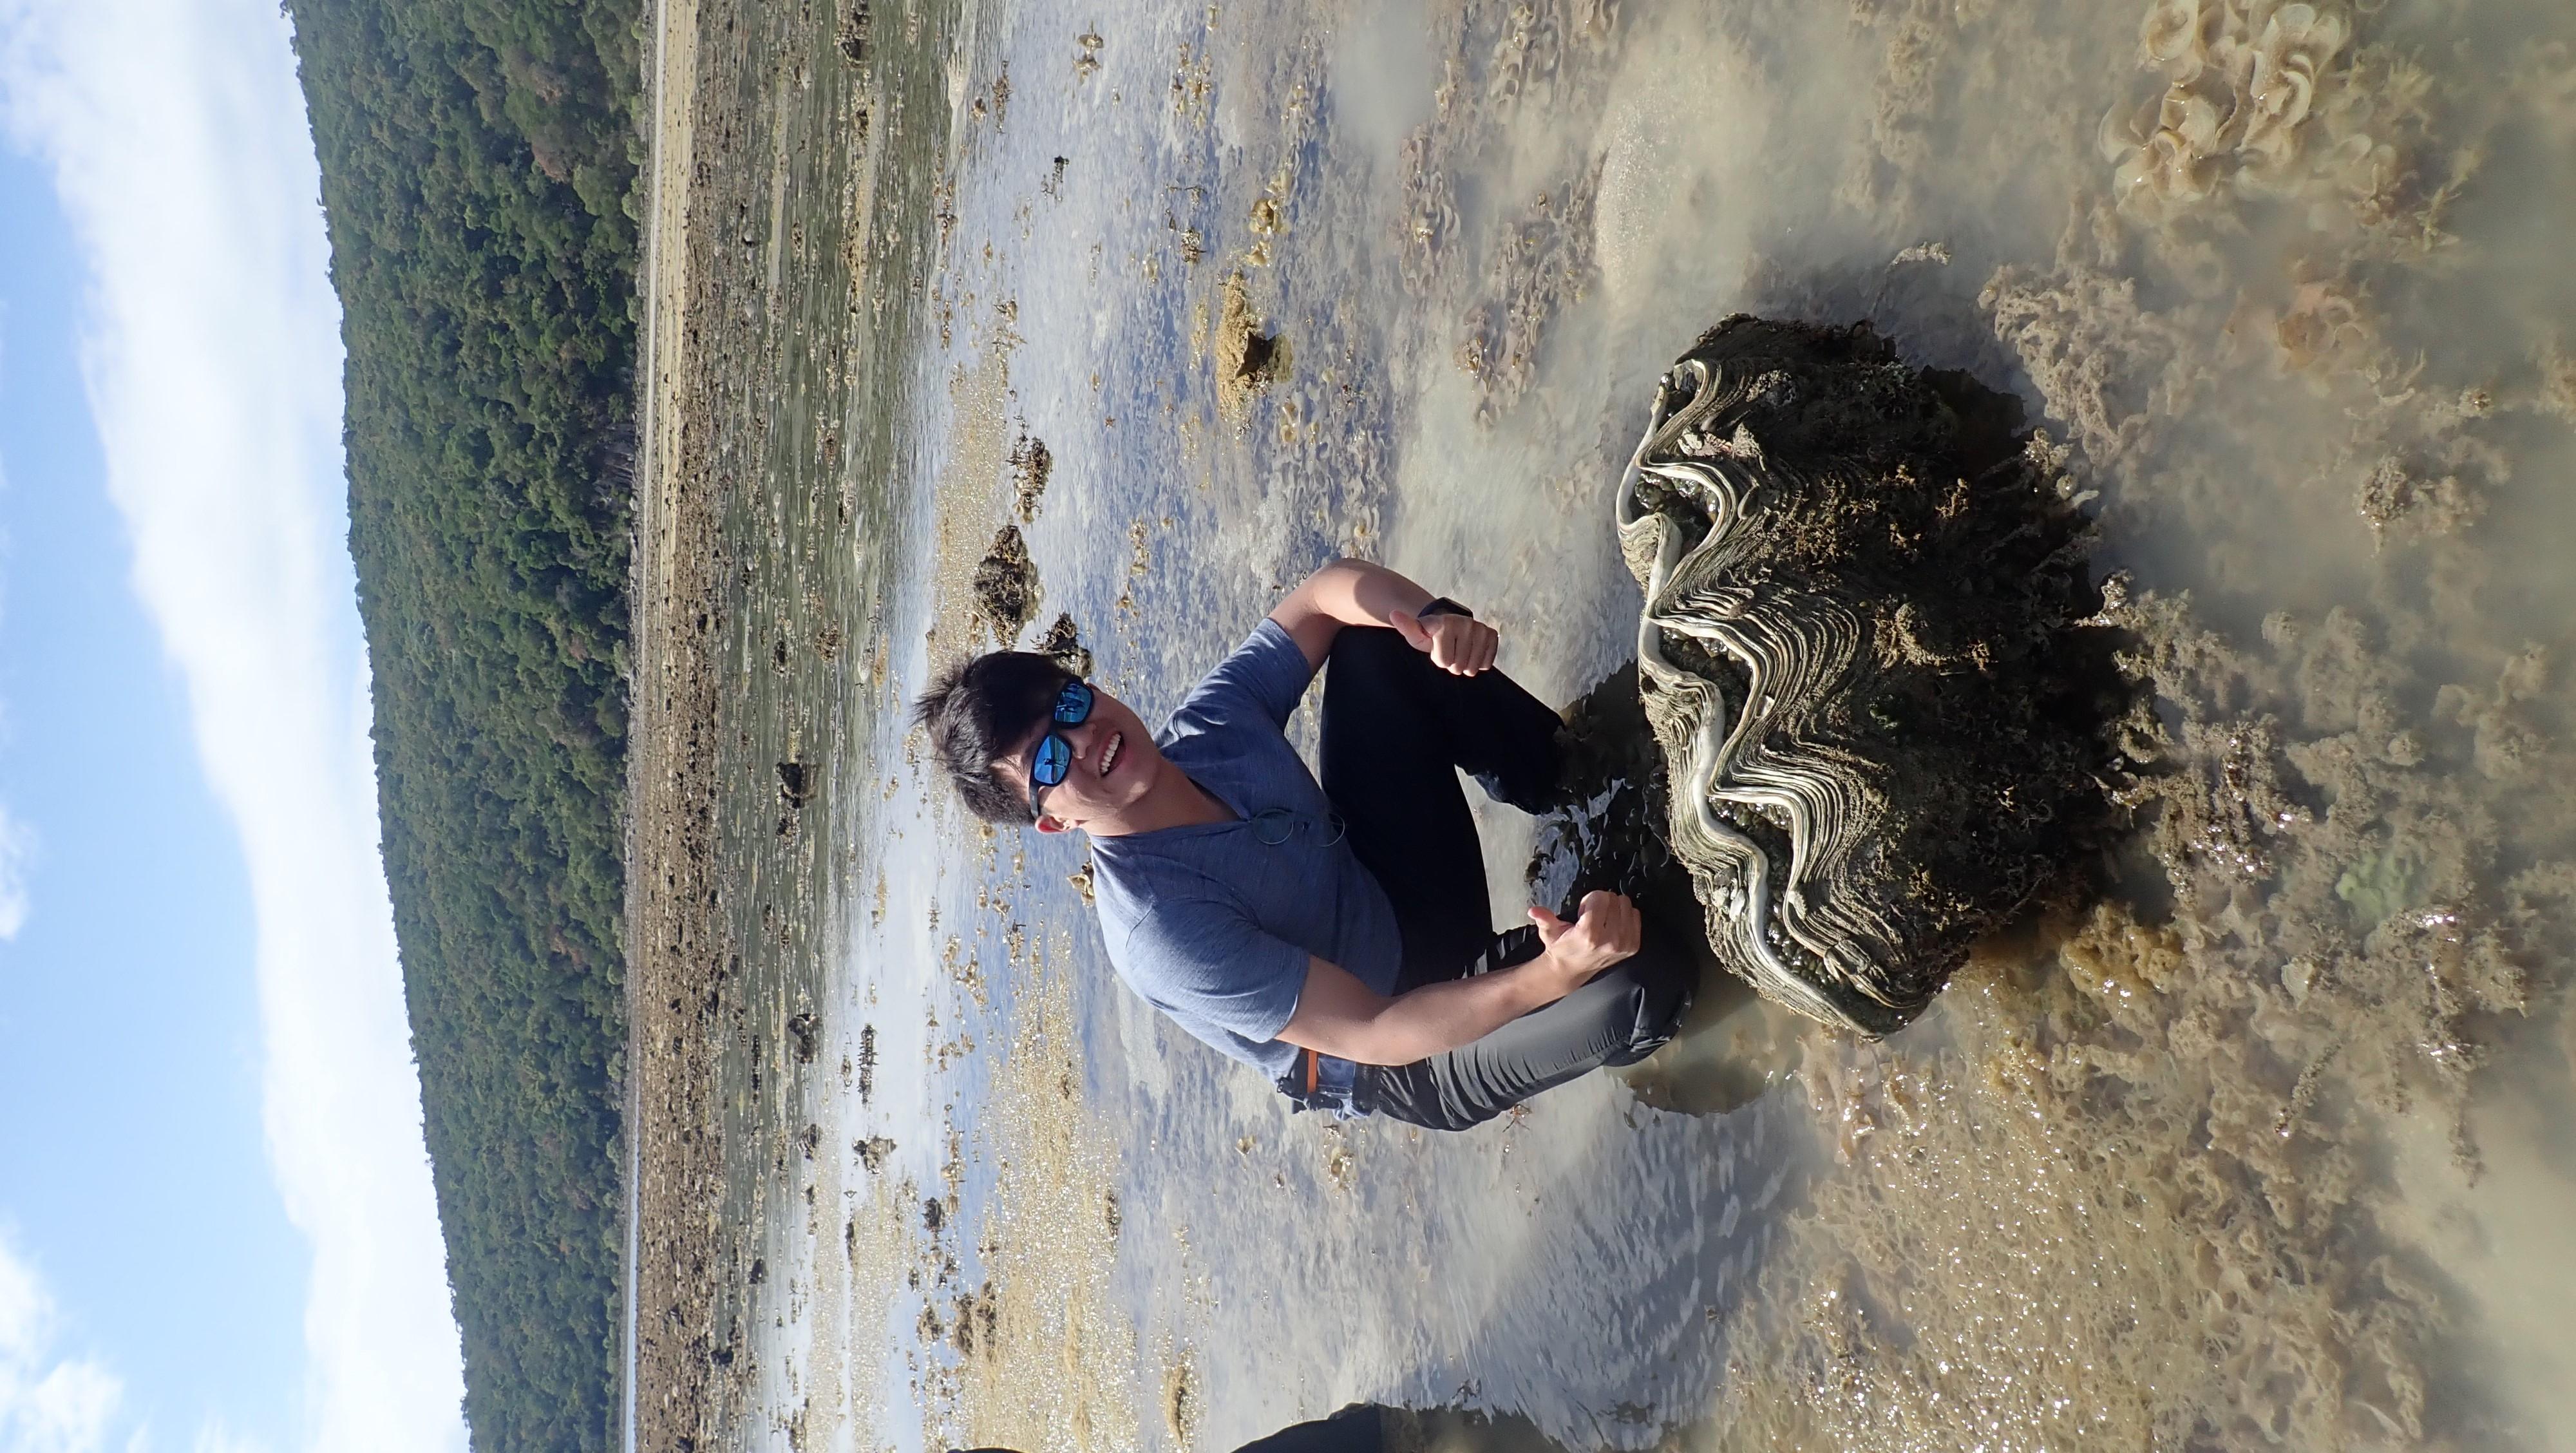 Giant_clam